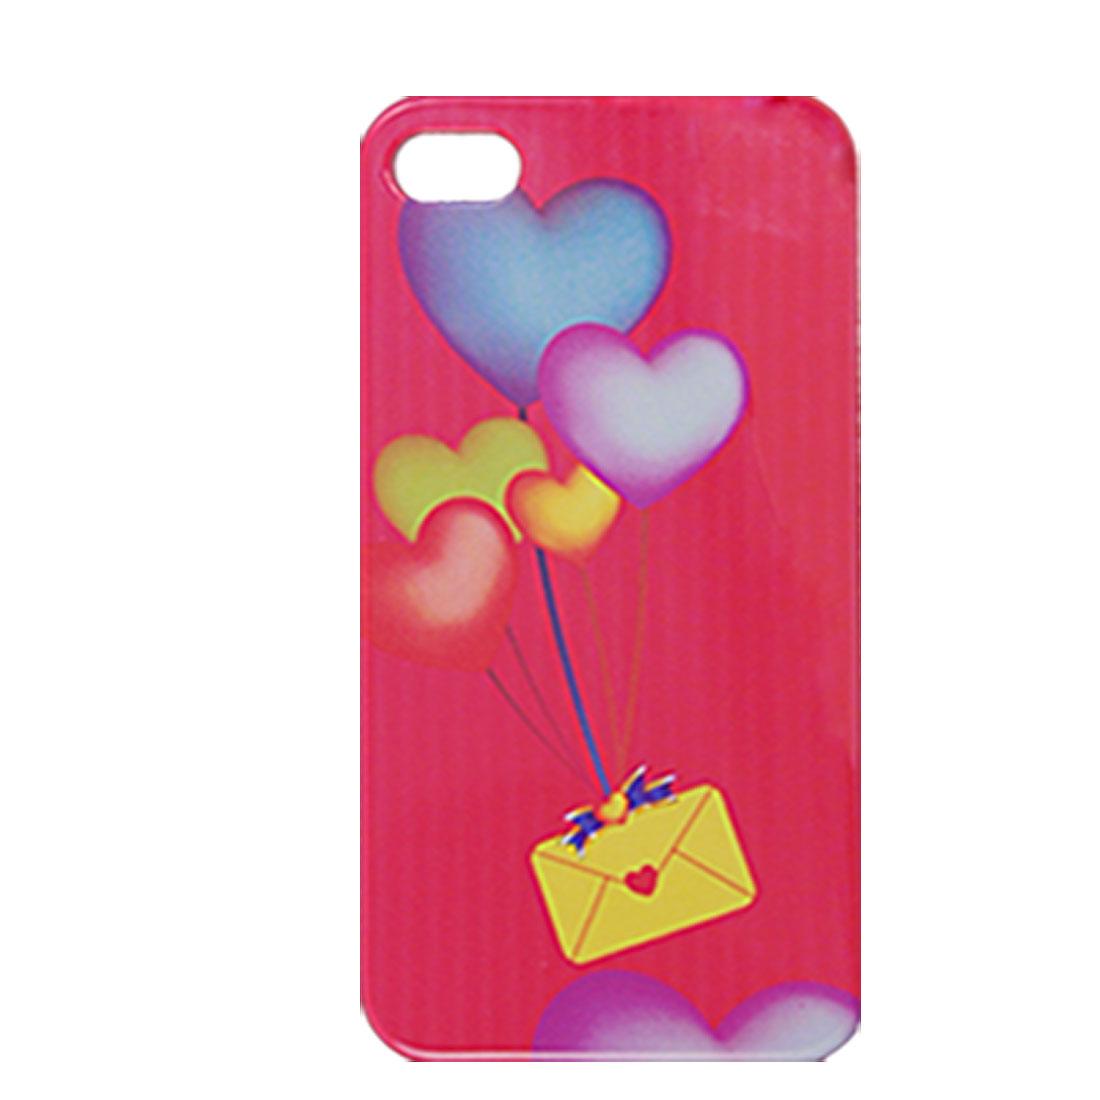 Heart Print Plastic IMD Magenta Back Case for iPhone 4 4G